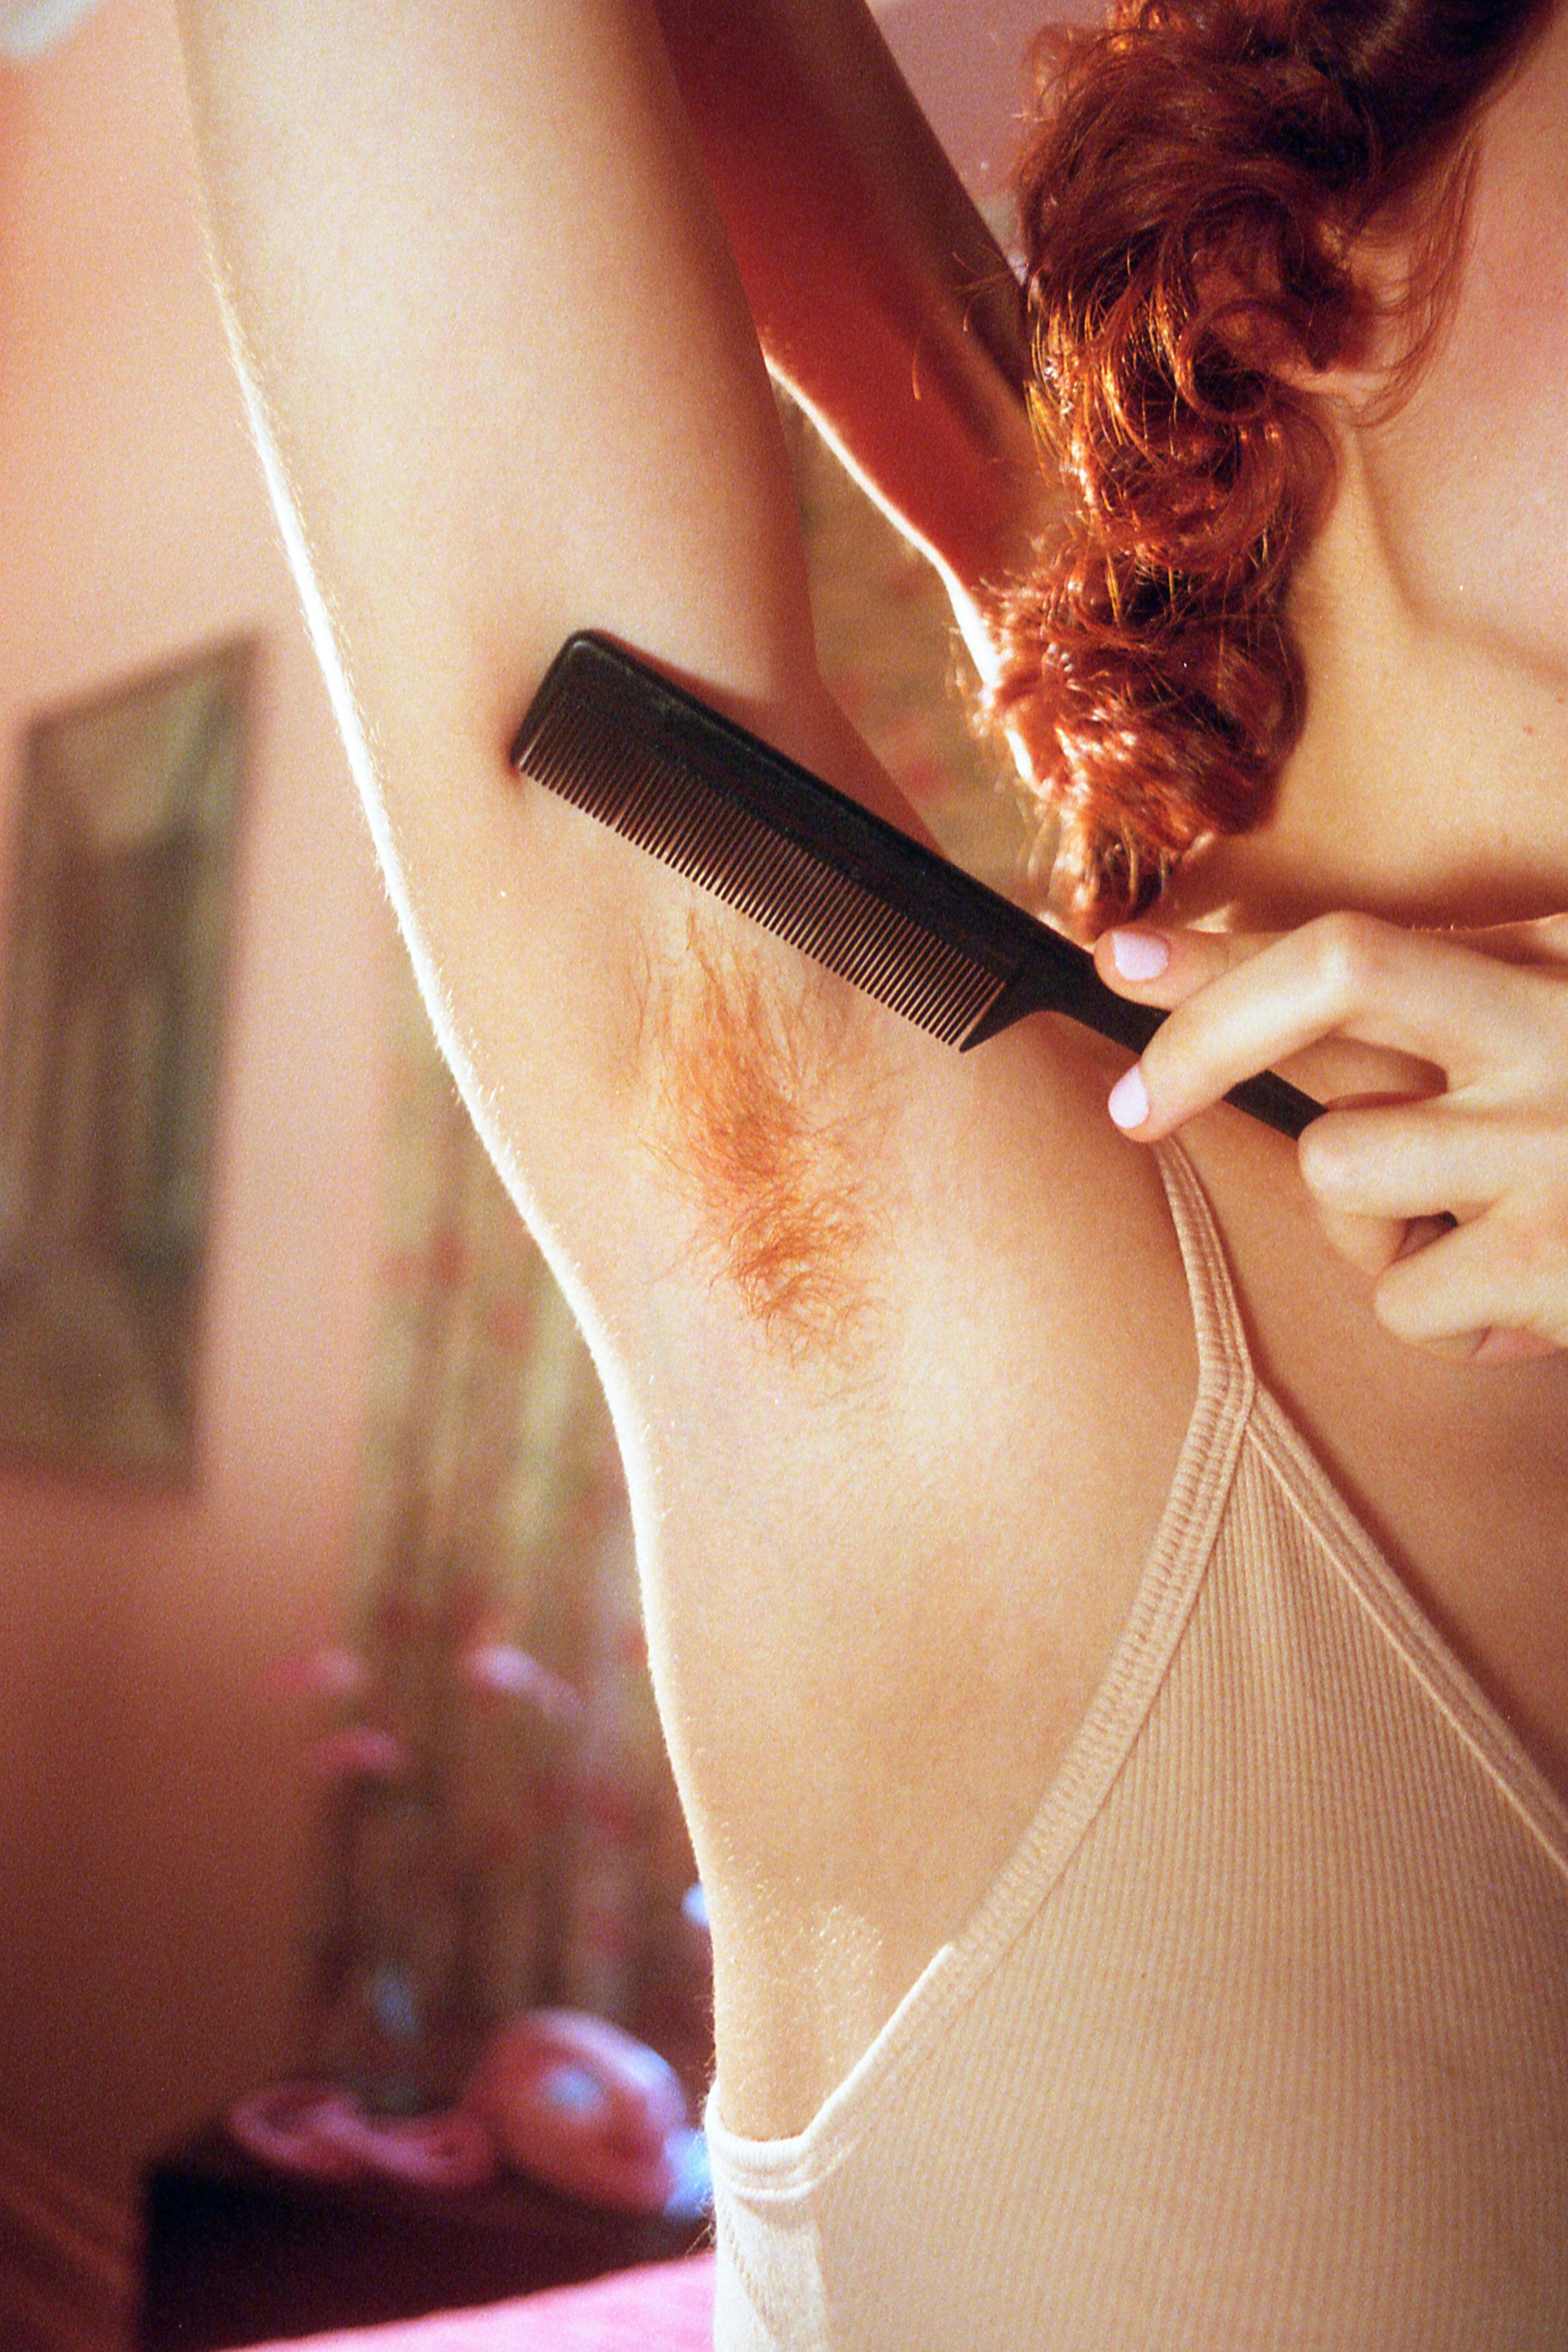 billie_project body hair_abd_bigumigu_